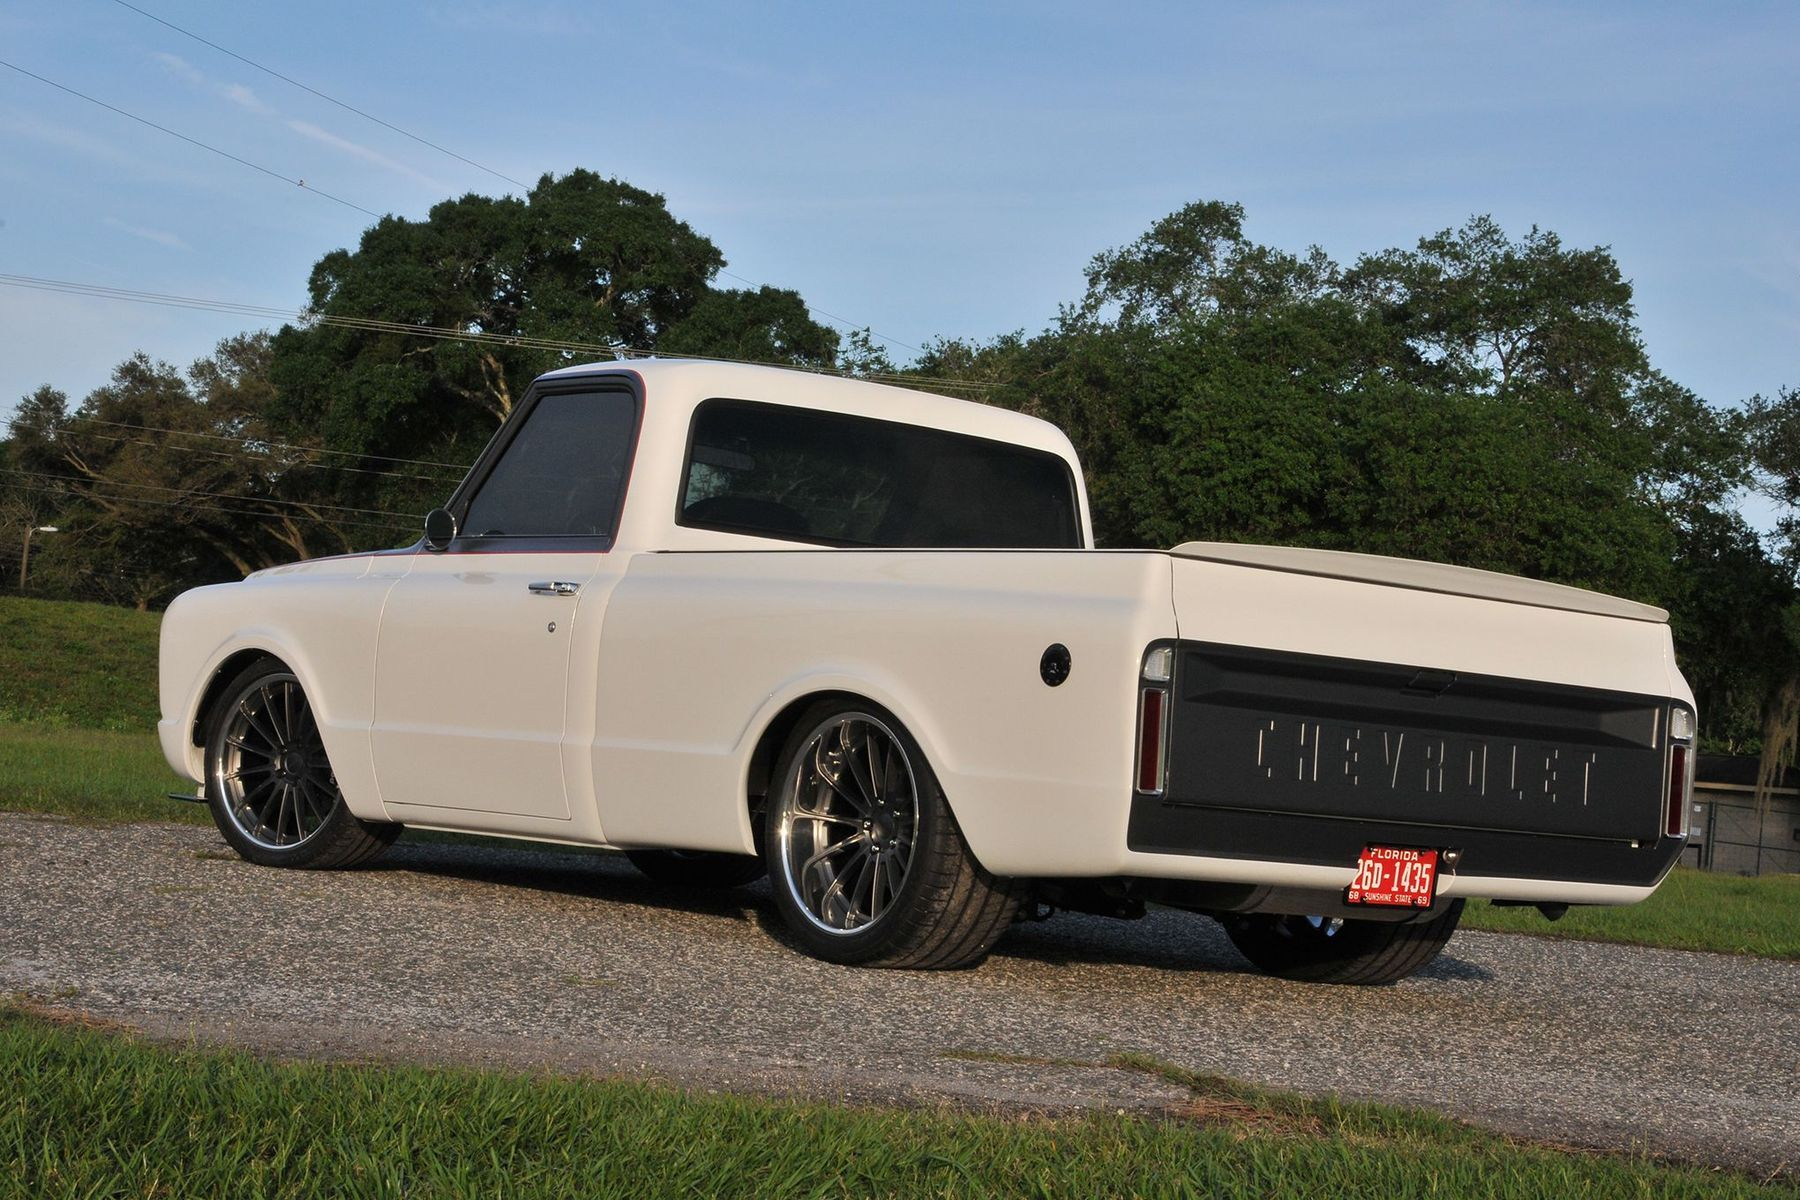 1968 Chevrolet C-10 | Tom Argue Design 1968 Chevy C10 on Forgeline MS3C Wheels